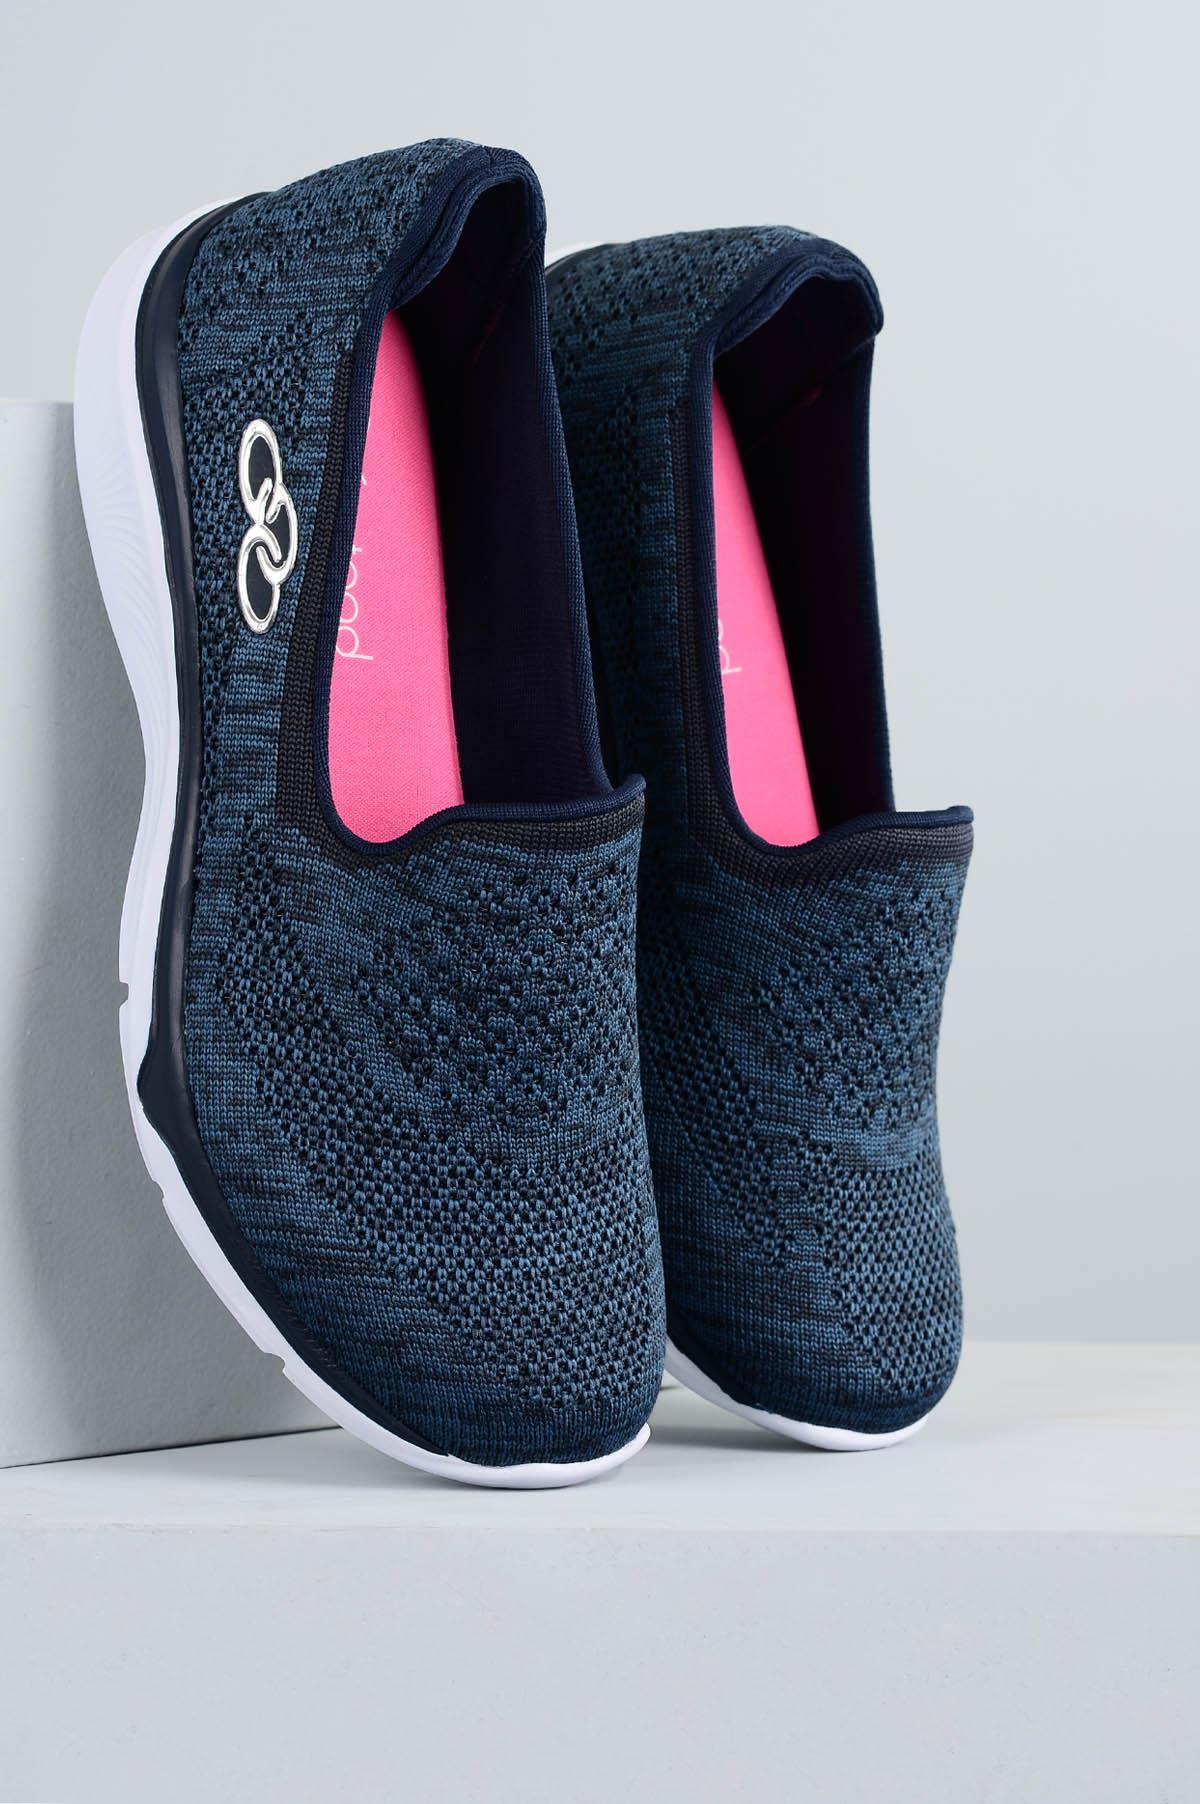 eecf605b044 Tênis Feminino Olympikus Princess TEC - MARINHO - Mundial Calçados